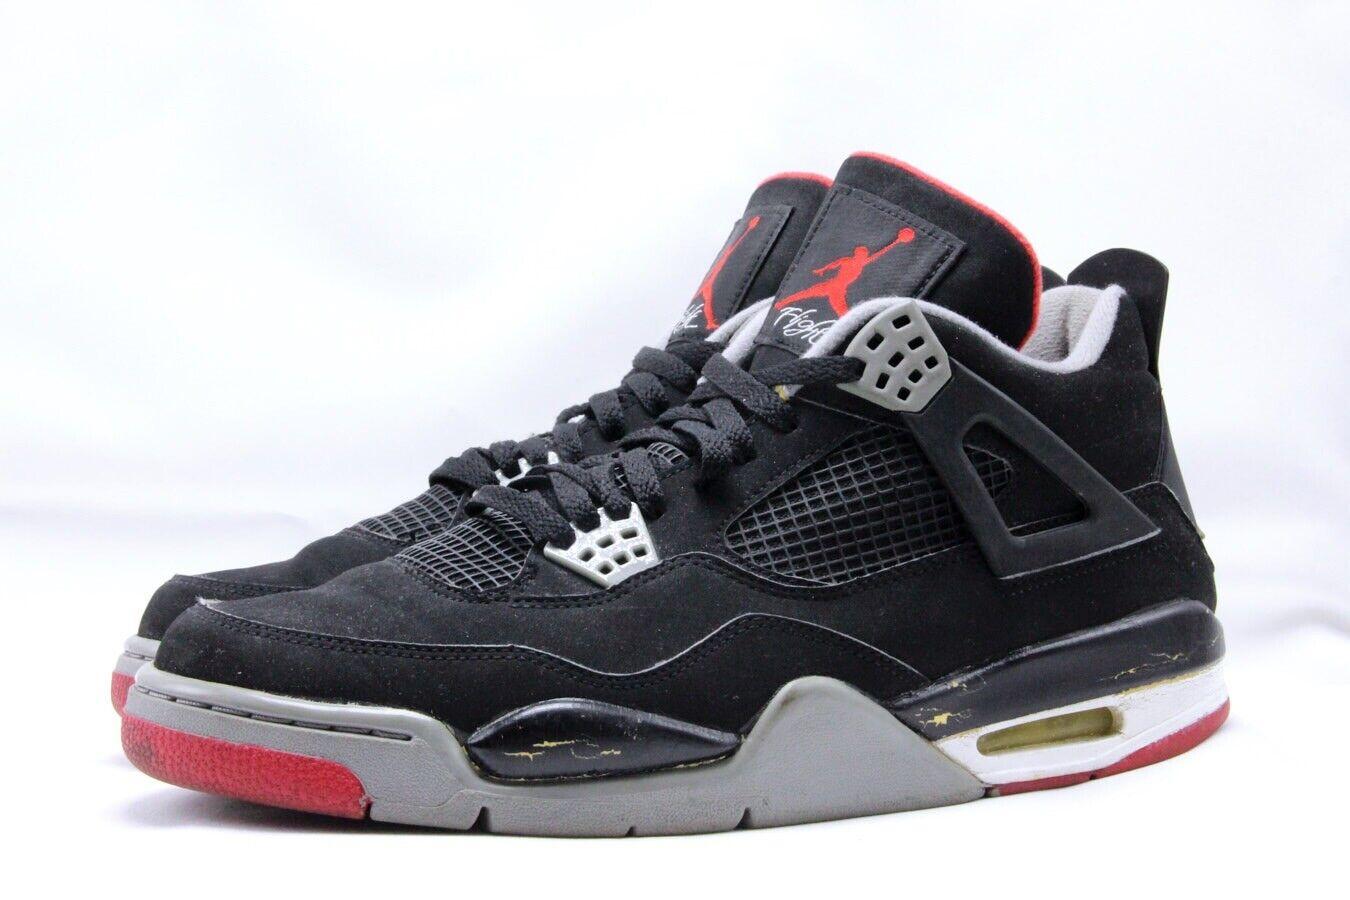 Air Jordan Retro 4 Collezione Brosso nero Cement grigio Varsity Varsity Varsity rosso 308497-003 20732a